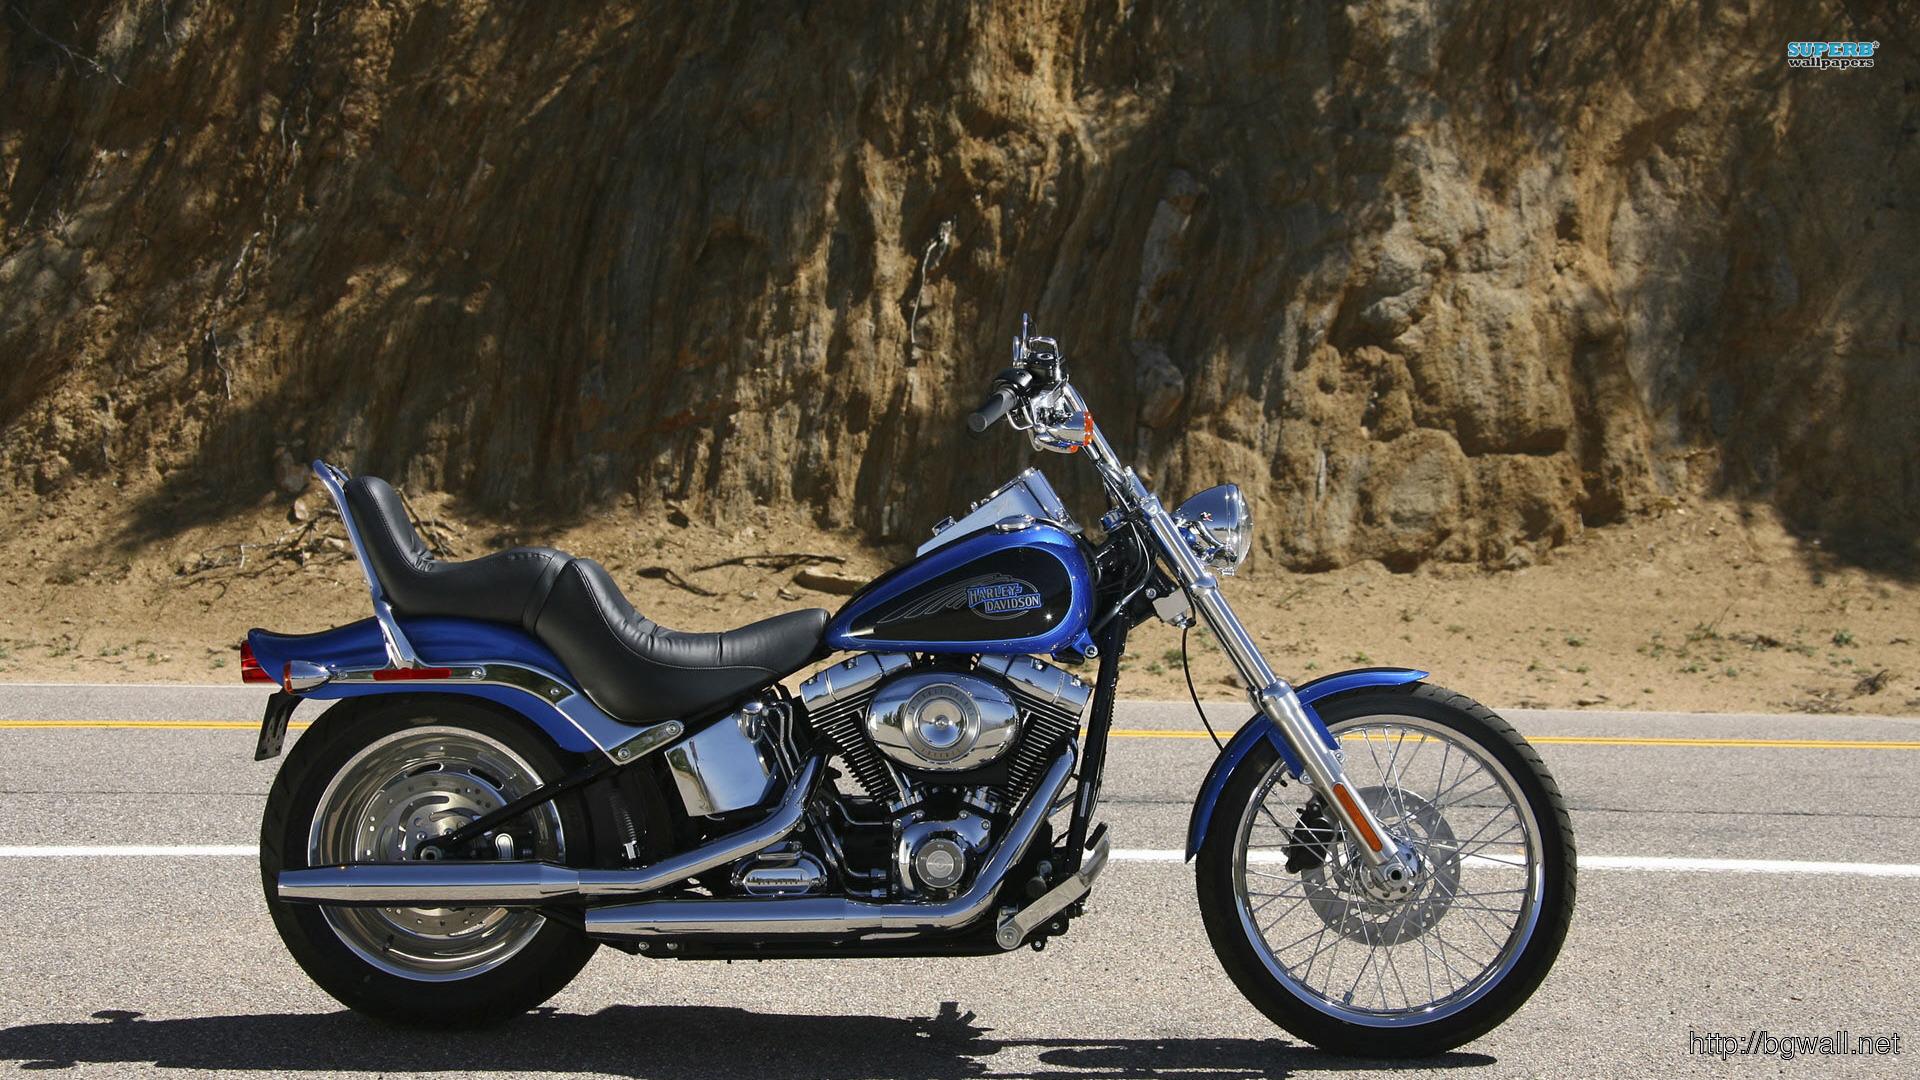 Harley Davidson Softail Custom Fxstc Wallpaper ...